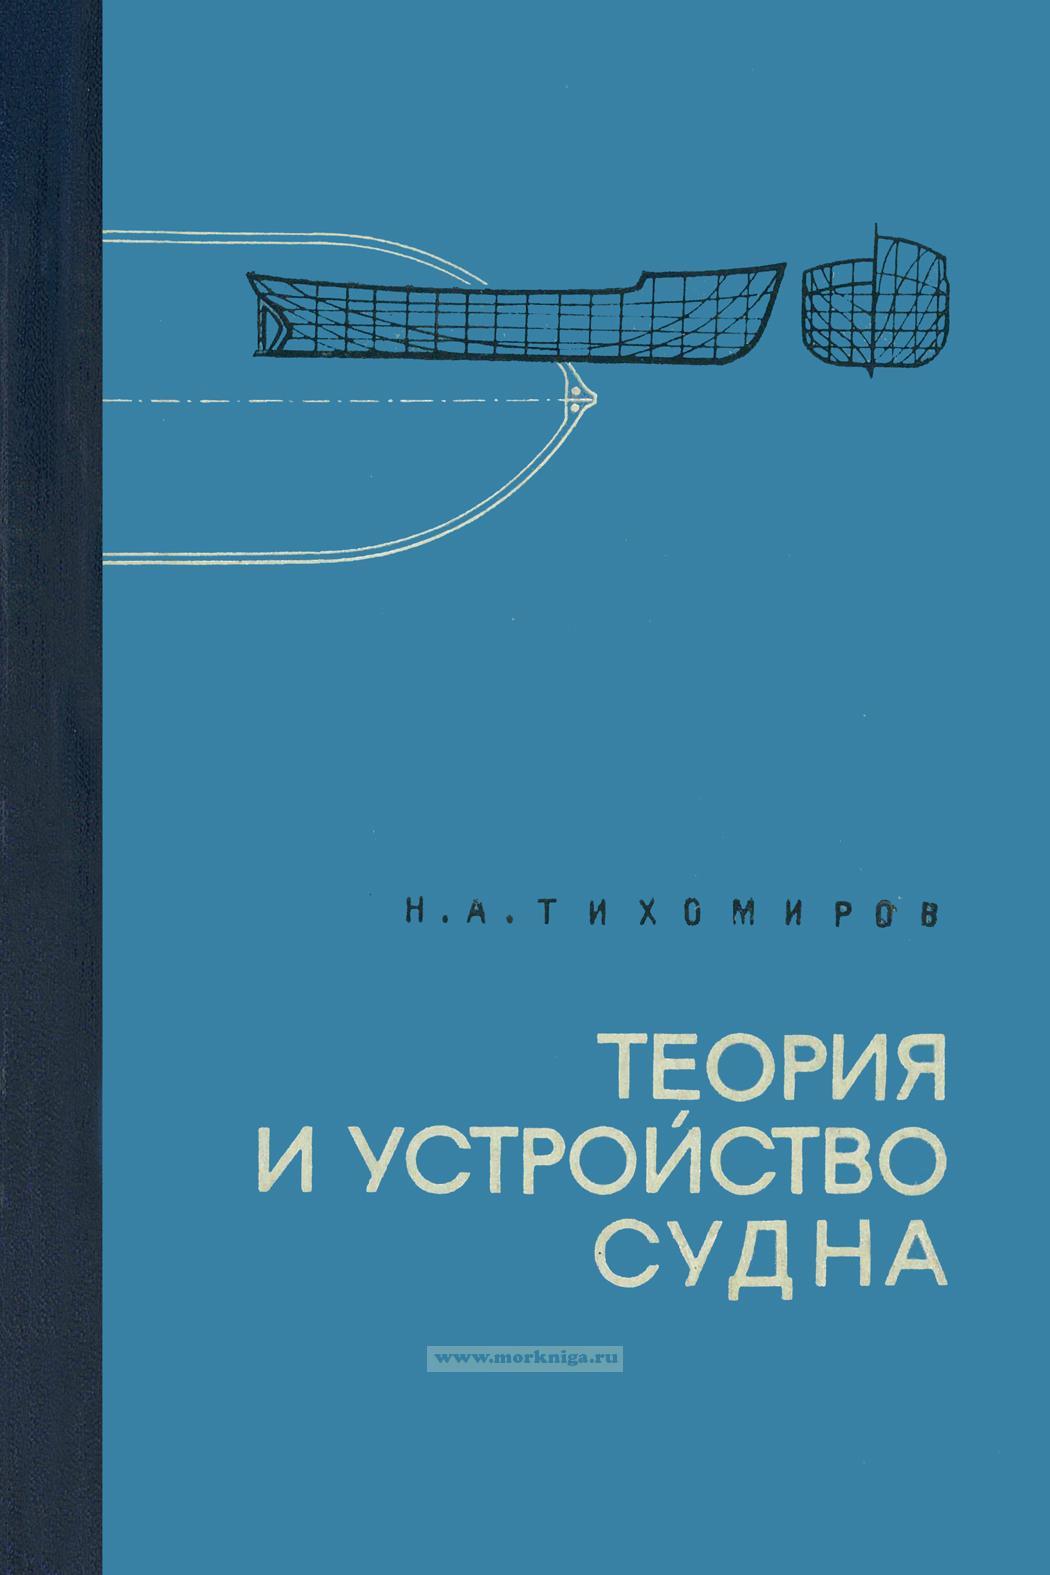 Теория и устройство судна внутреннего плавания